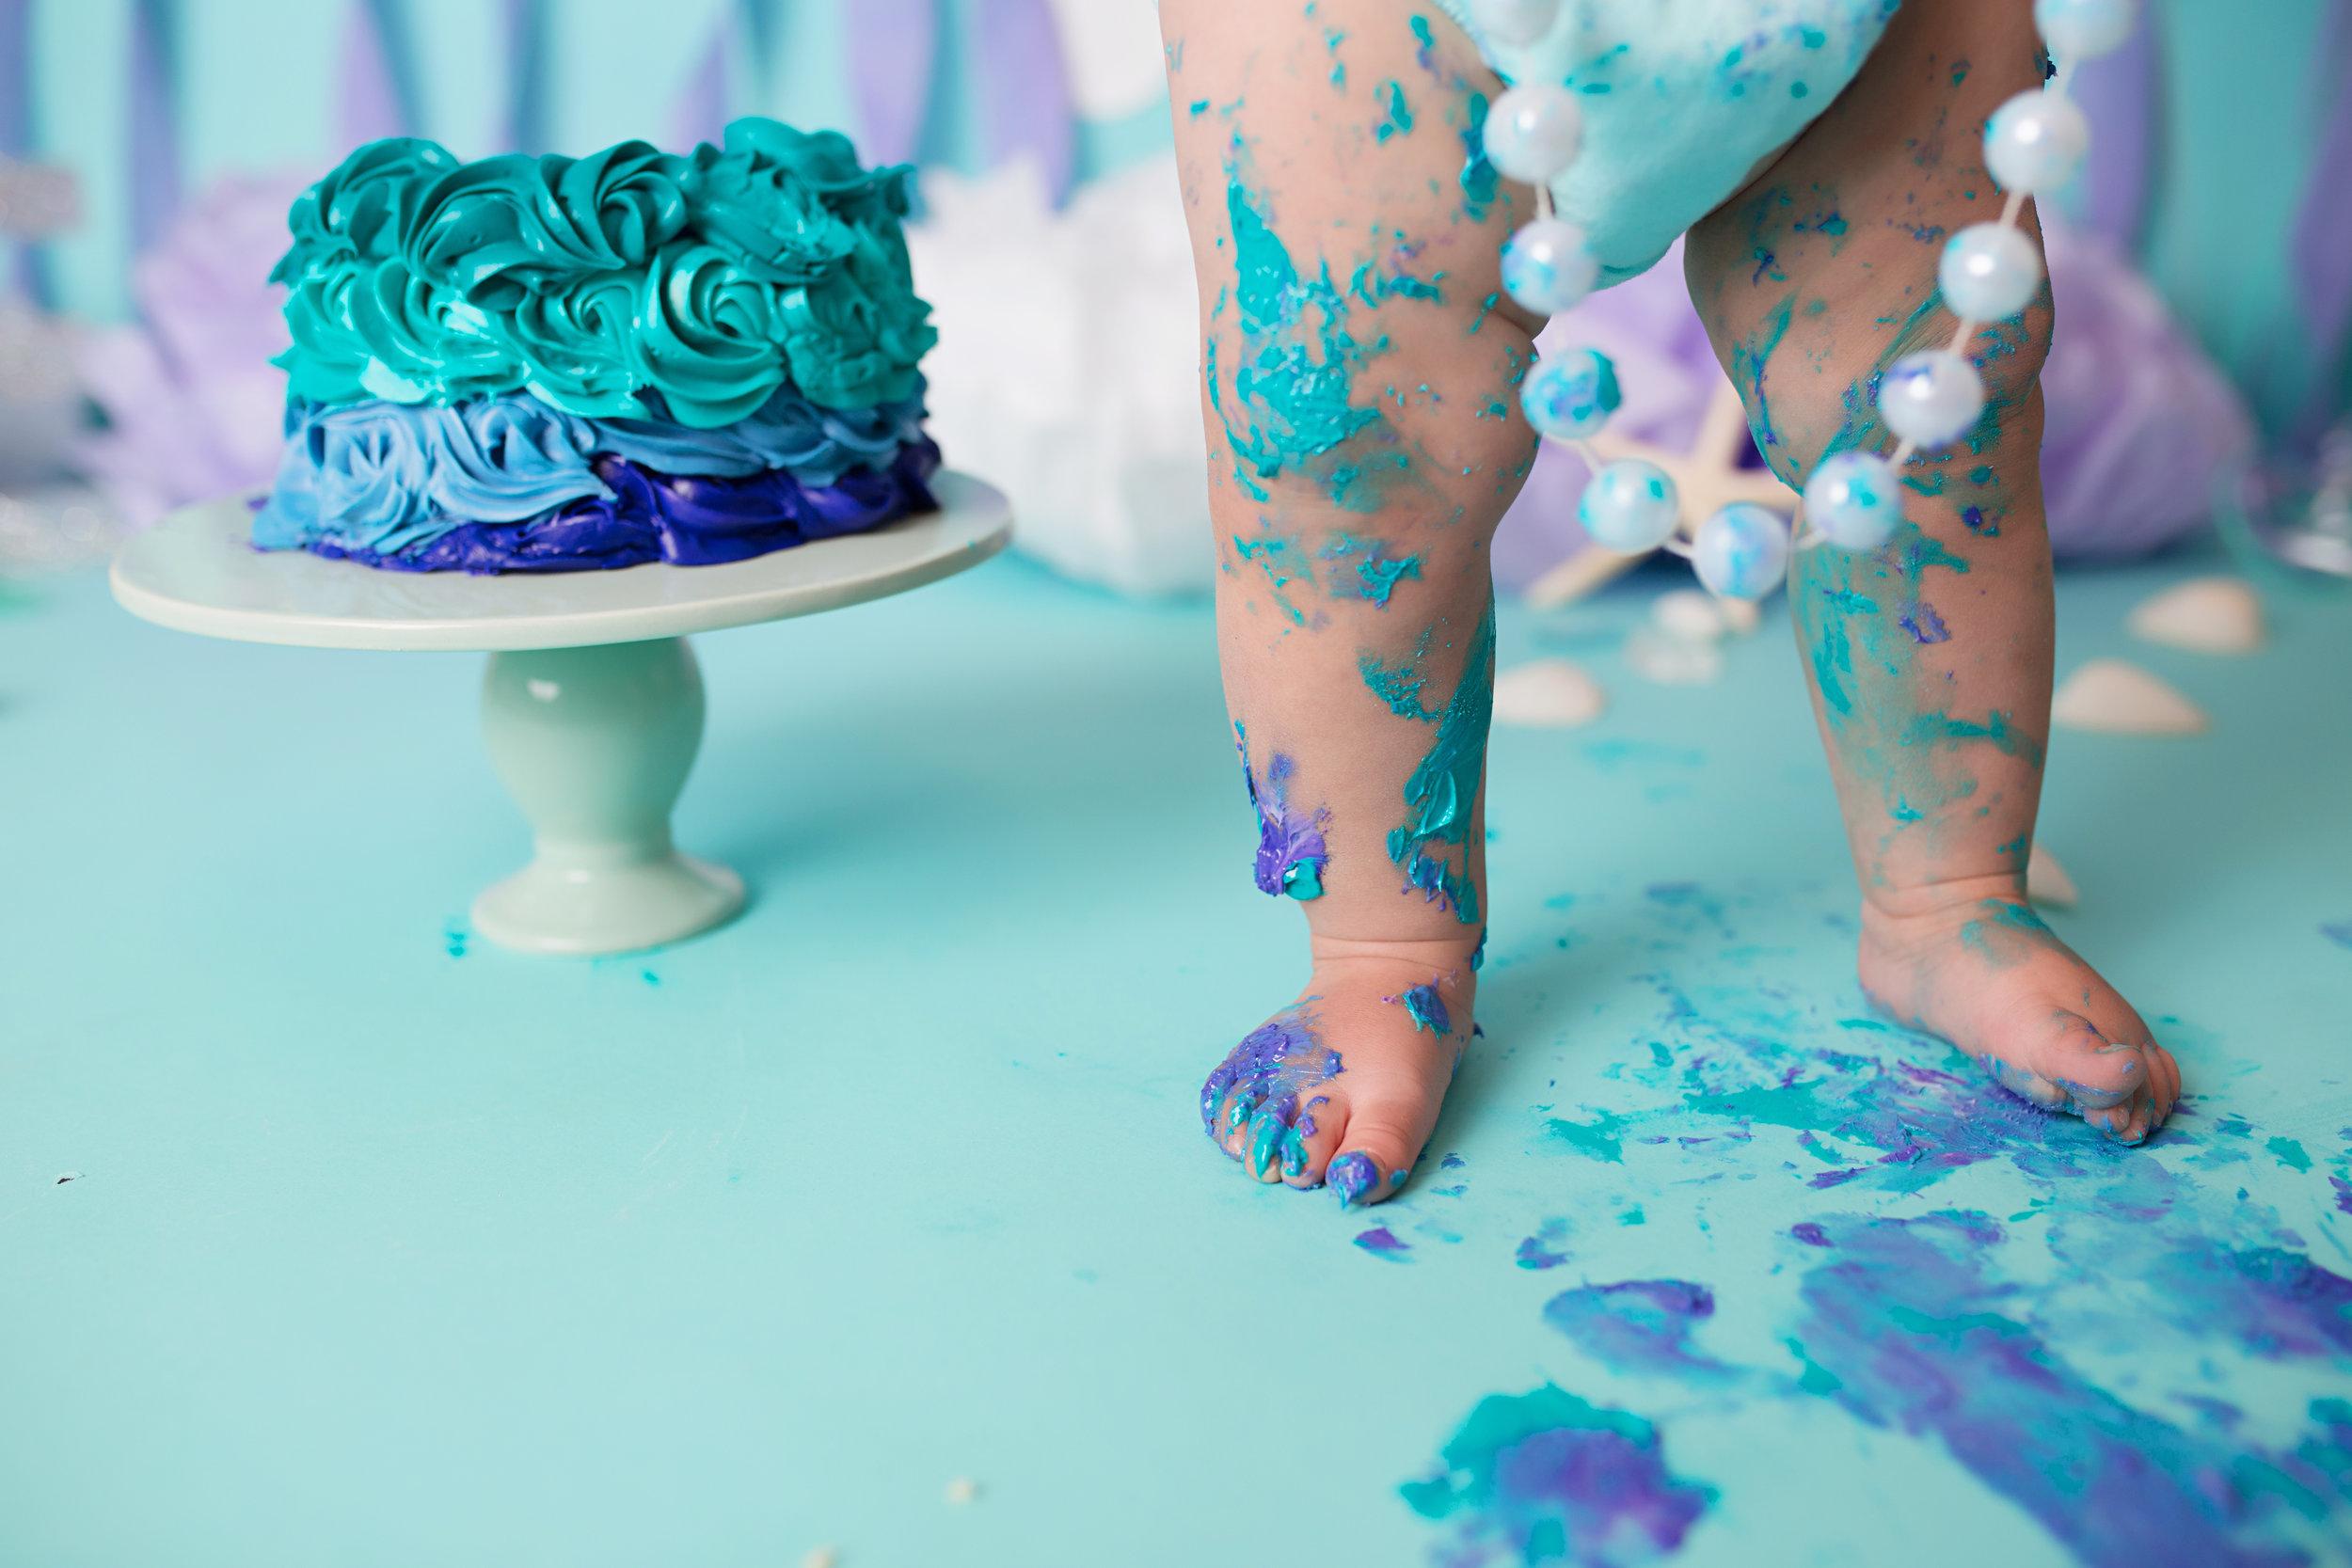 anchorage-cake-smash-photography-10.jpg